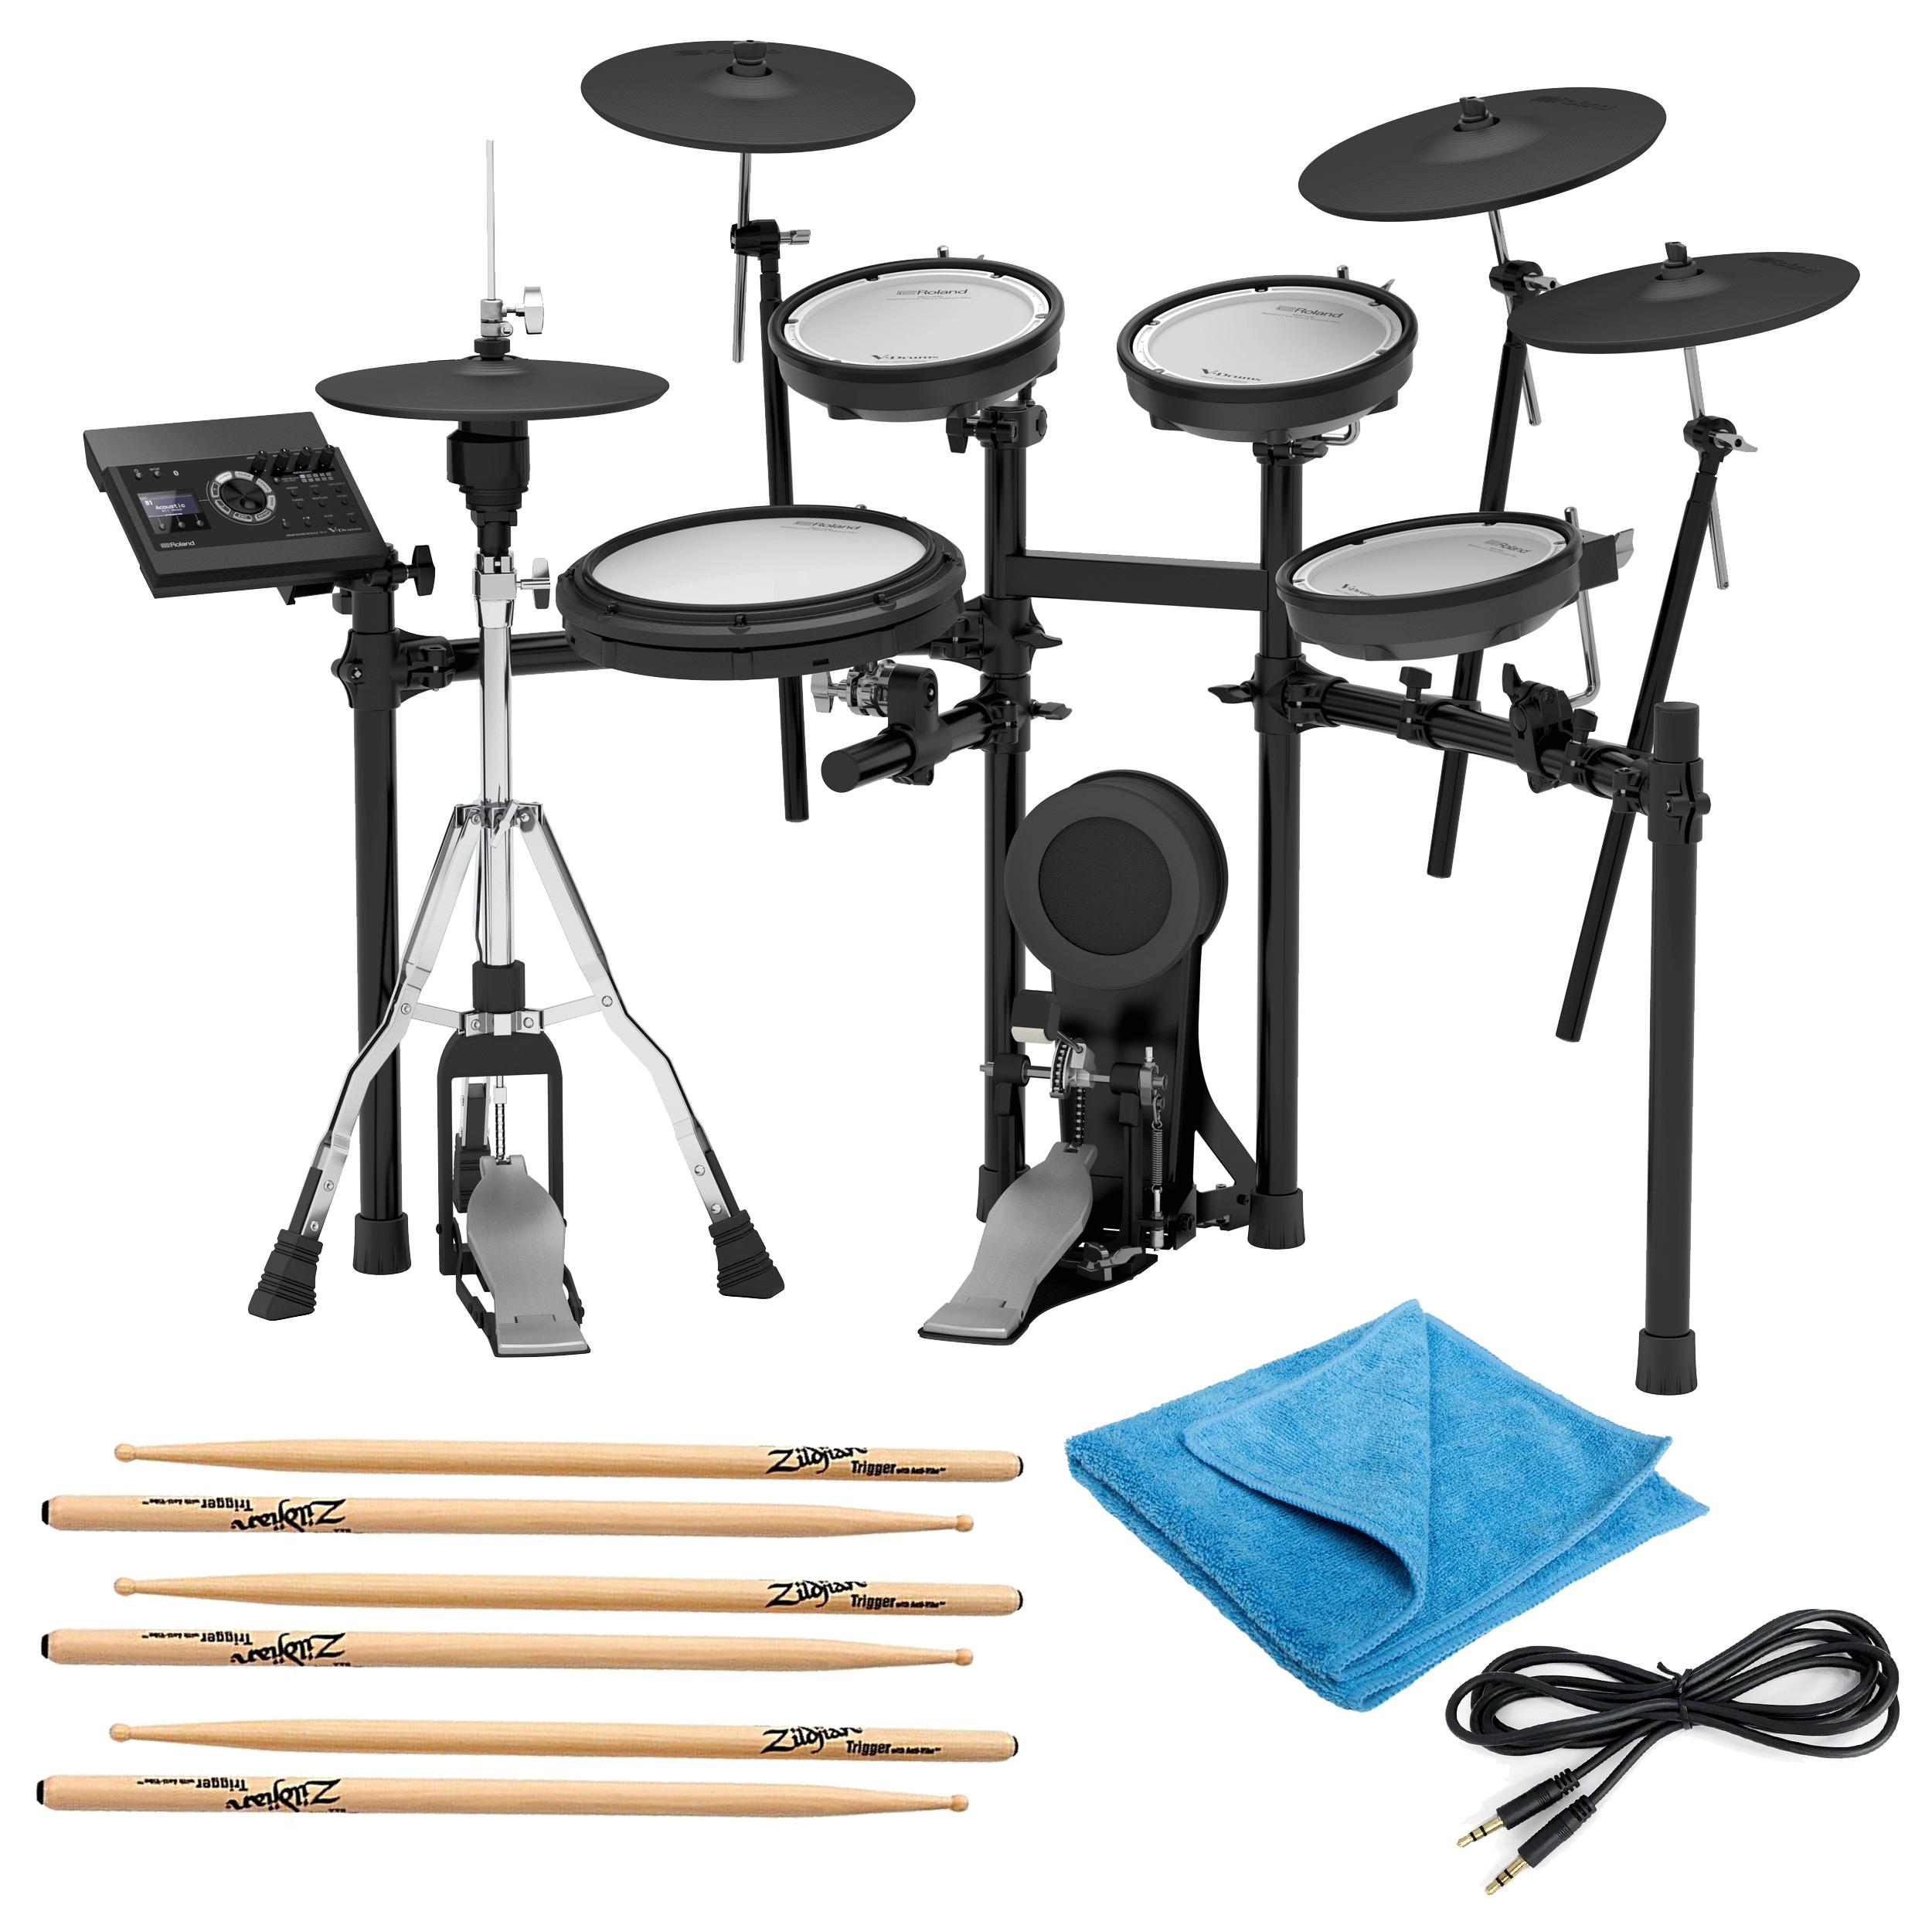 Details about Roland TD-17KVX Electronic Drum Set w/3 Pairs of Sticks,  Audio Cable & Cloth